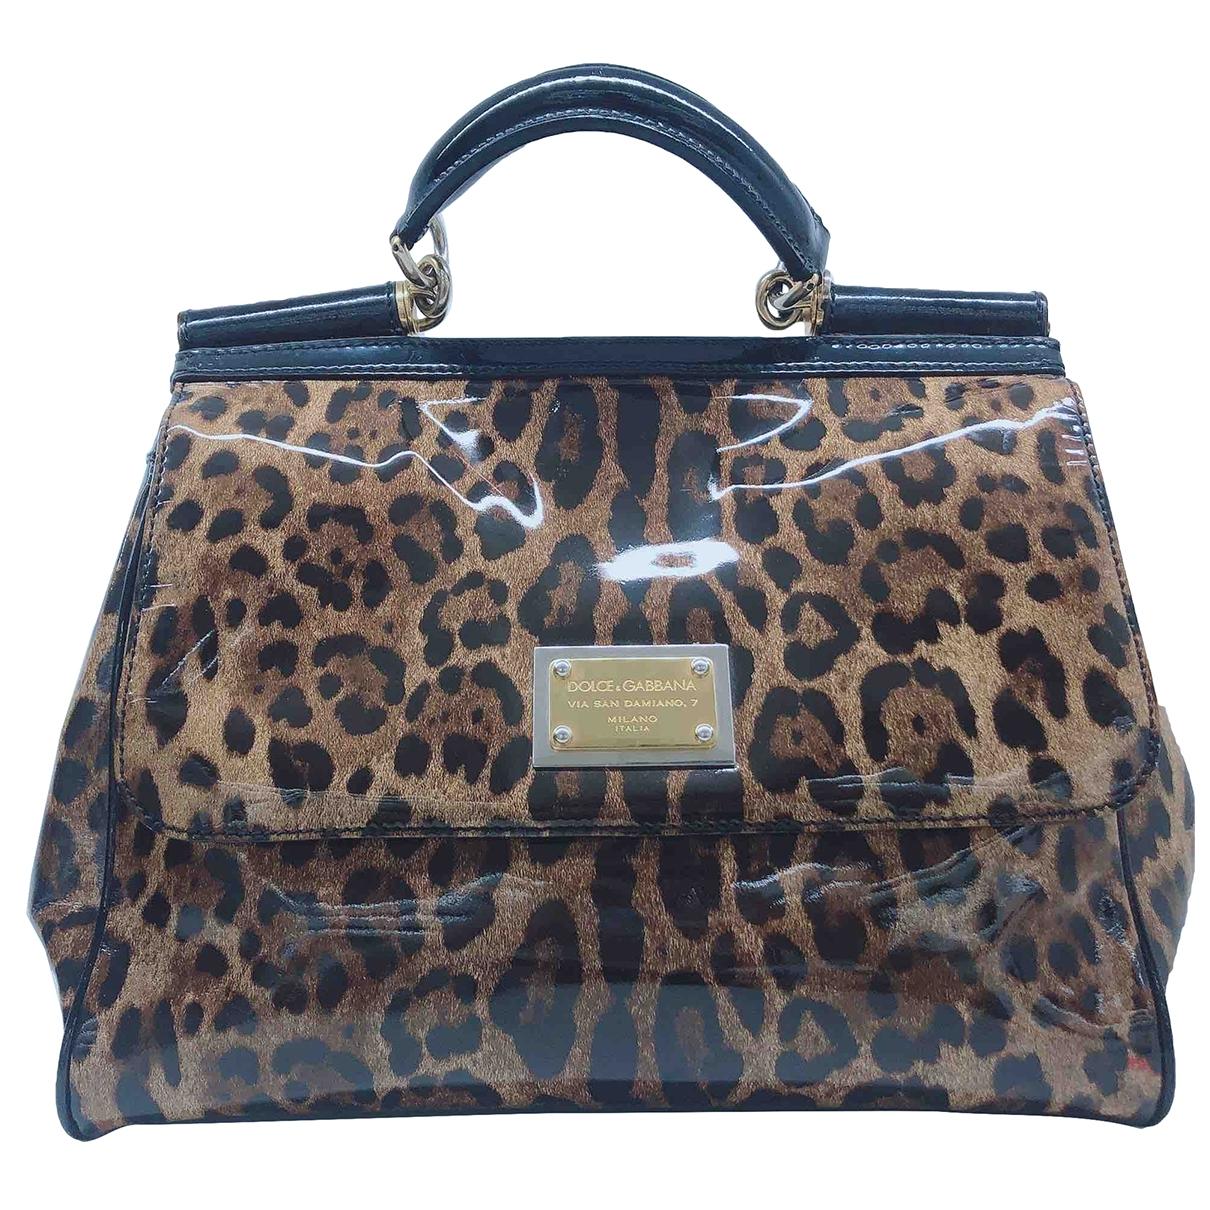 Dolce & Gabbana Sicily Handtasche in  Bunt Lackleder